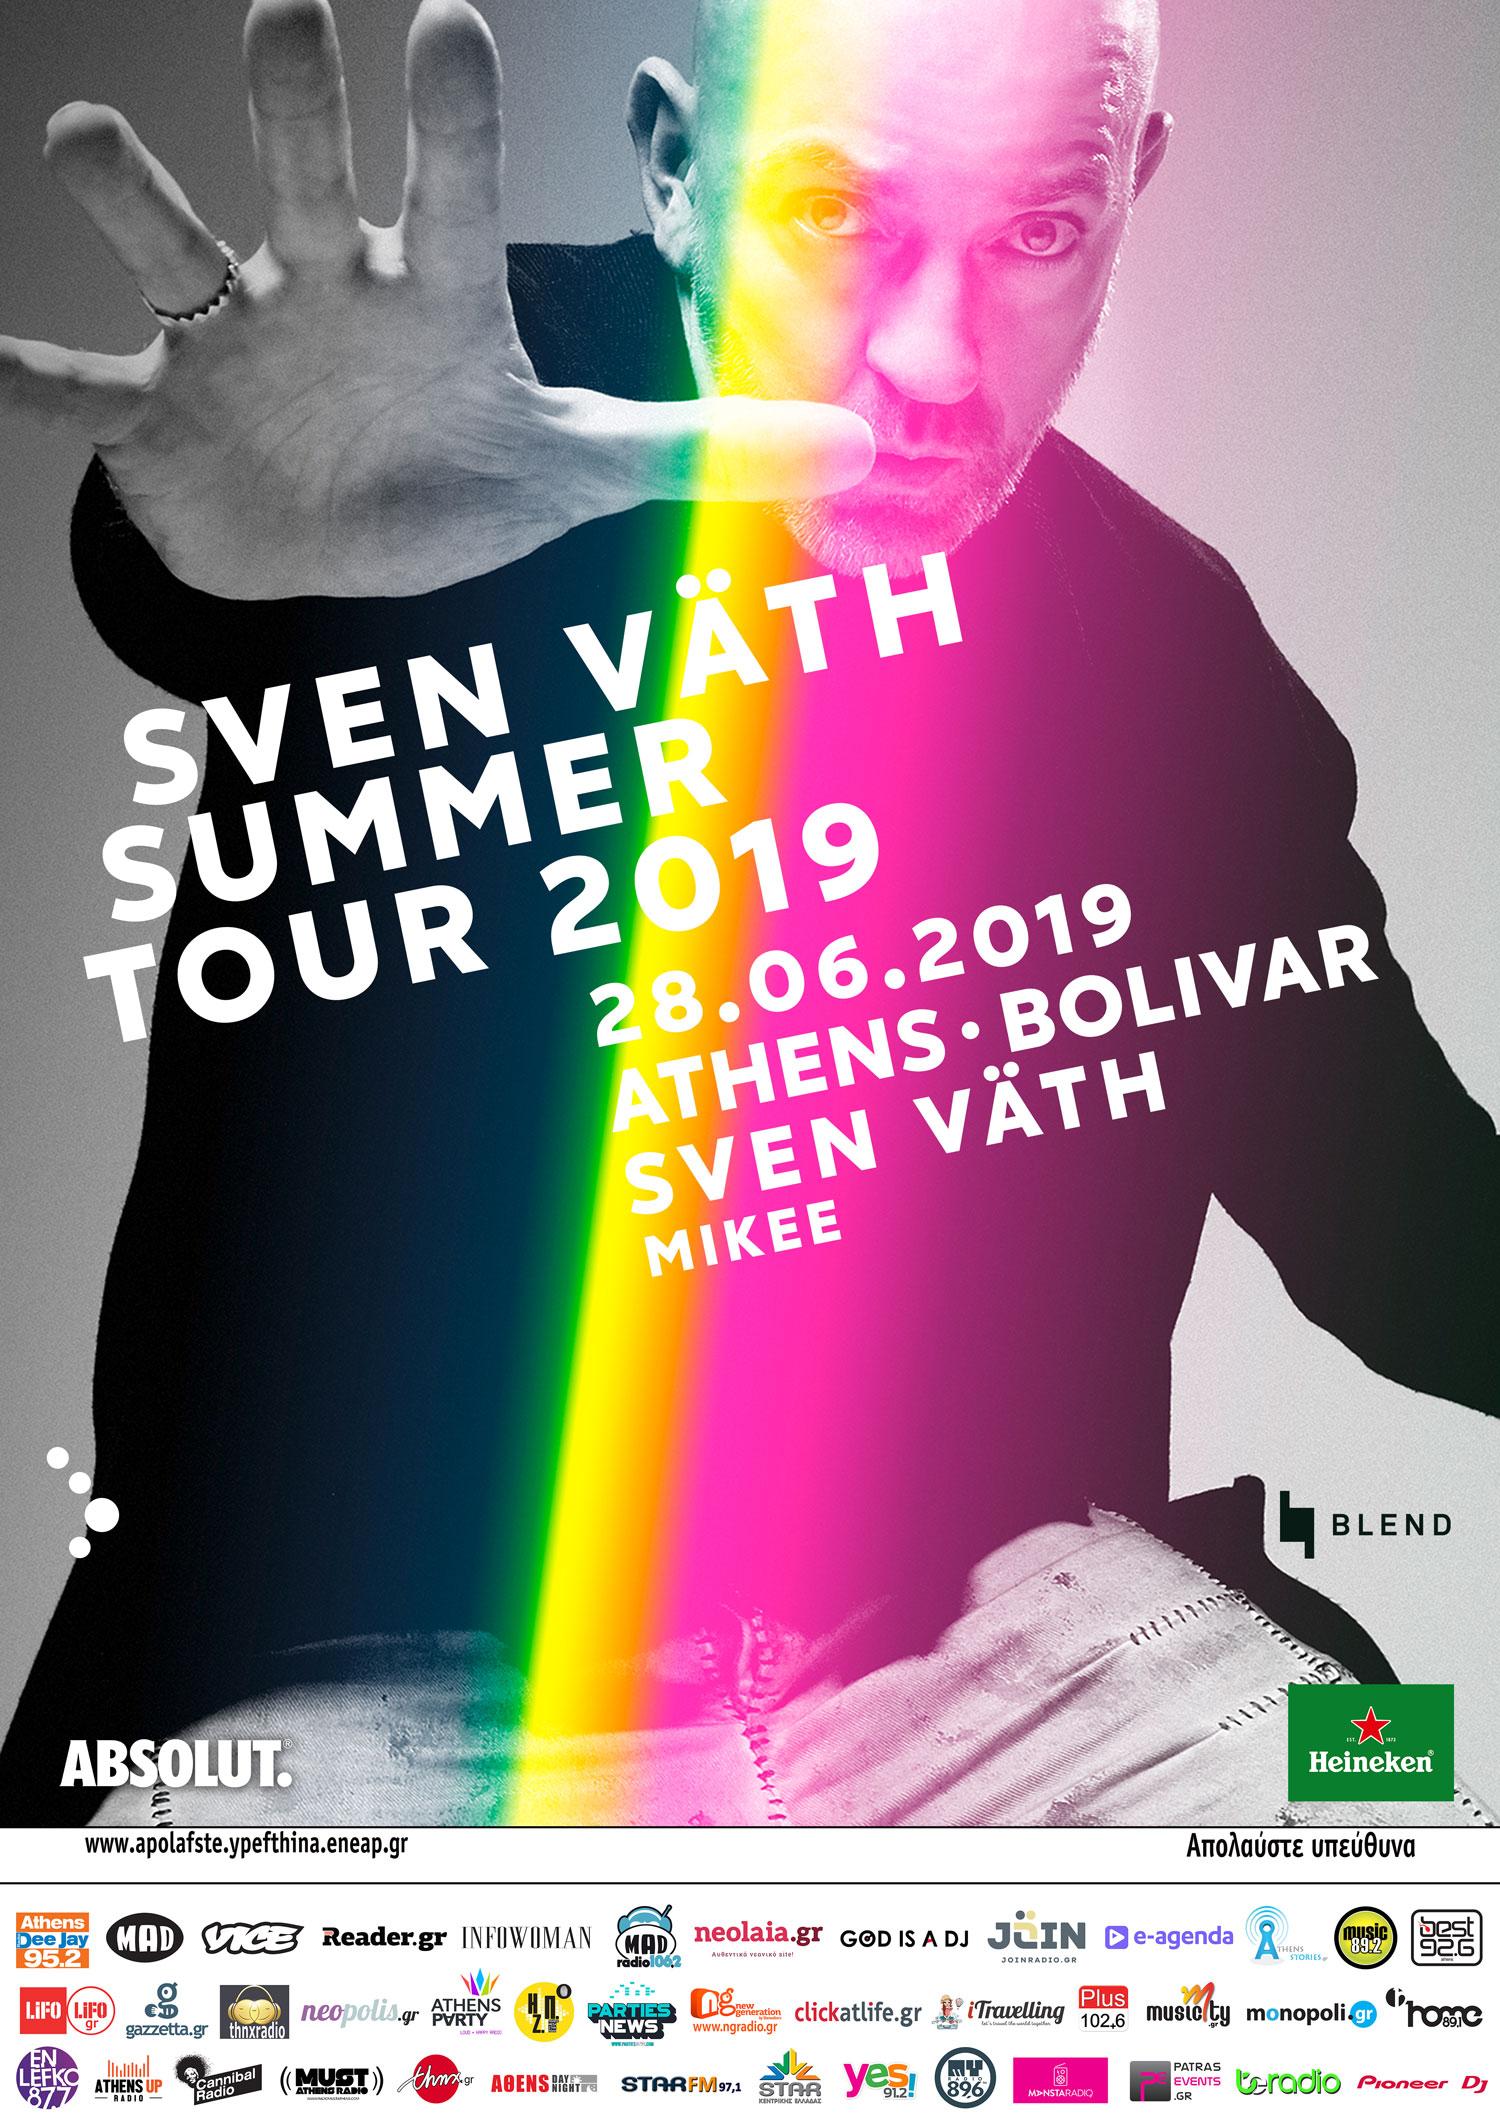 Sven Vath Poster